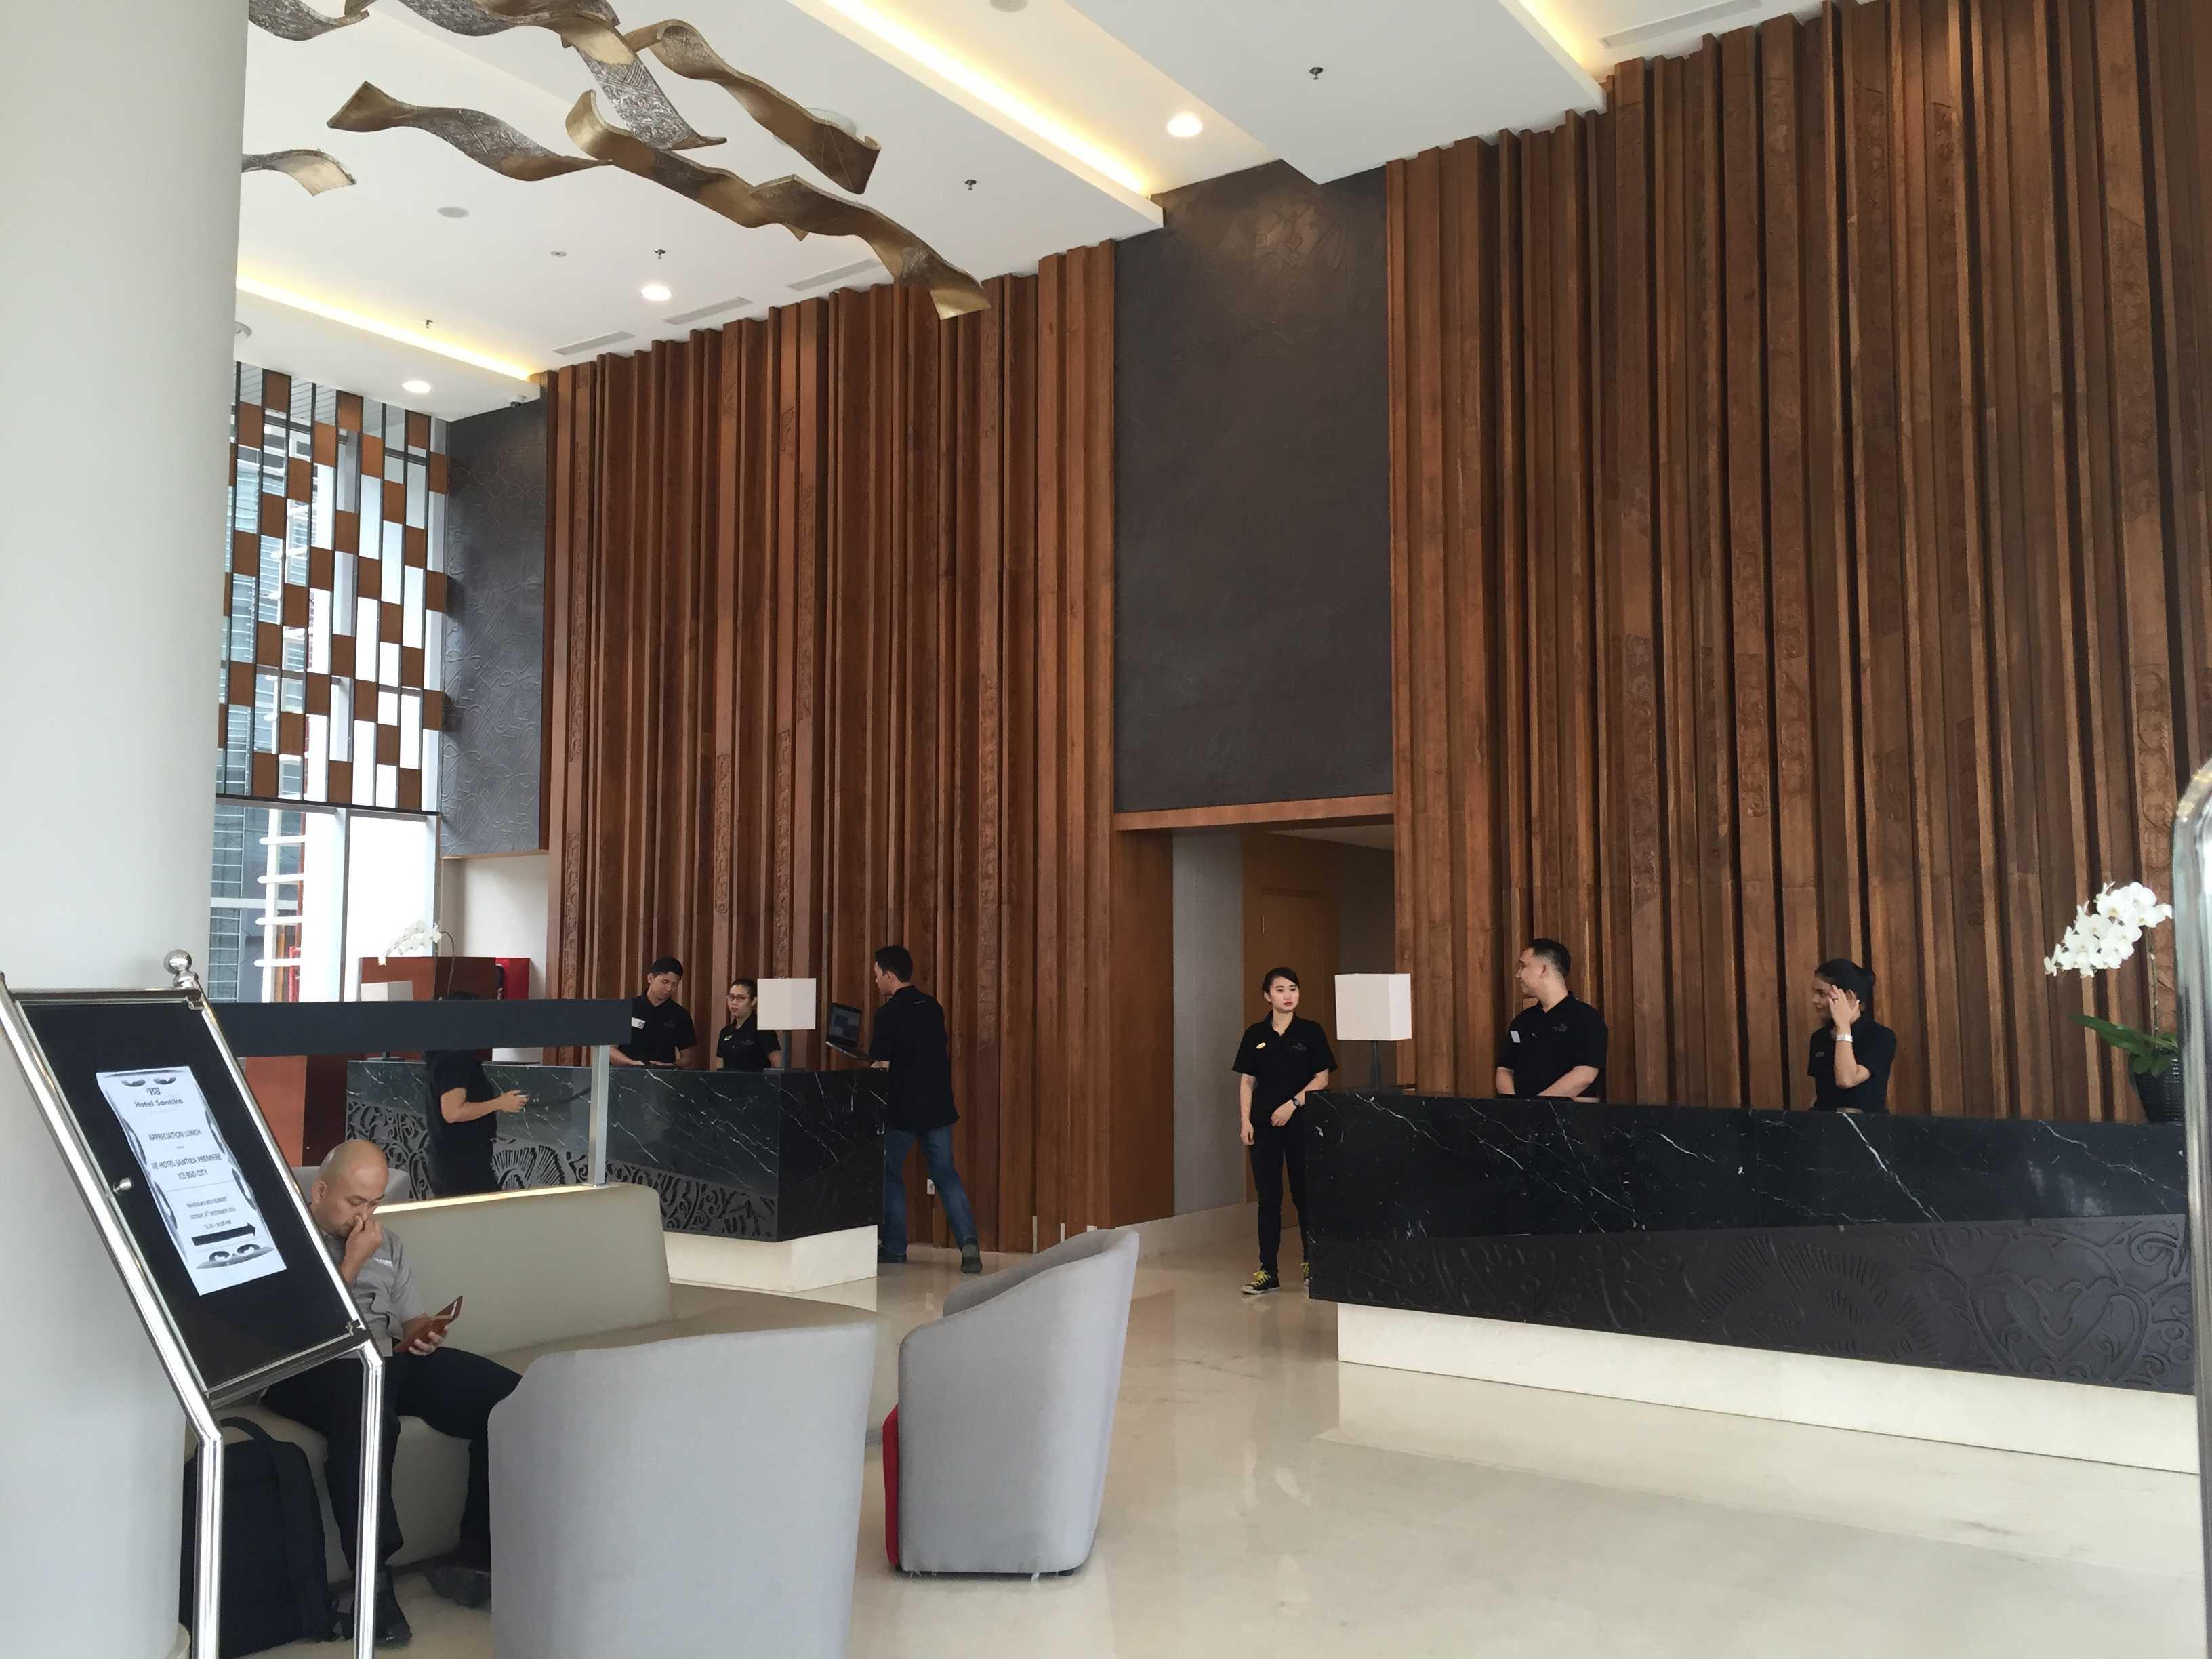 Farissa Achmadi 3 Star Hotel At Bsd Tangerang, Indonesia Tangerang, Indonesia Reception - Lobby Kontemporer  8646